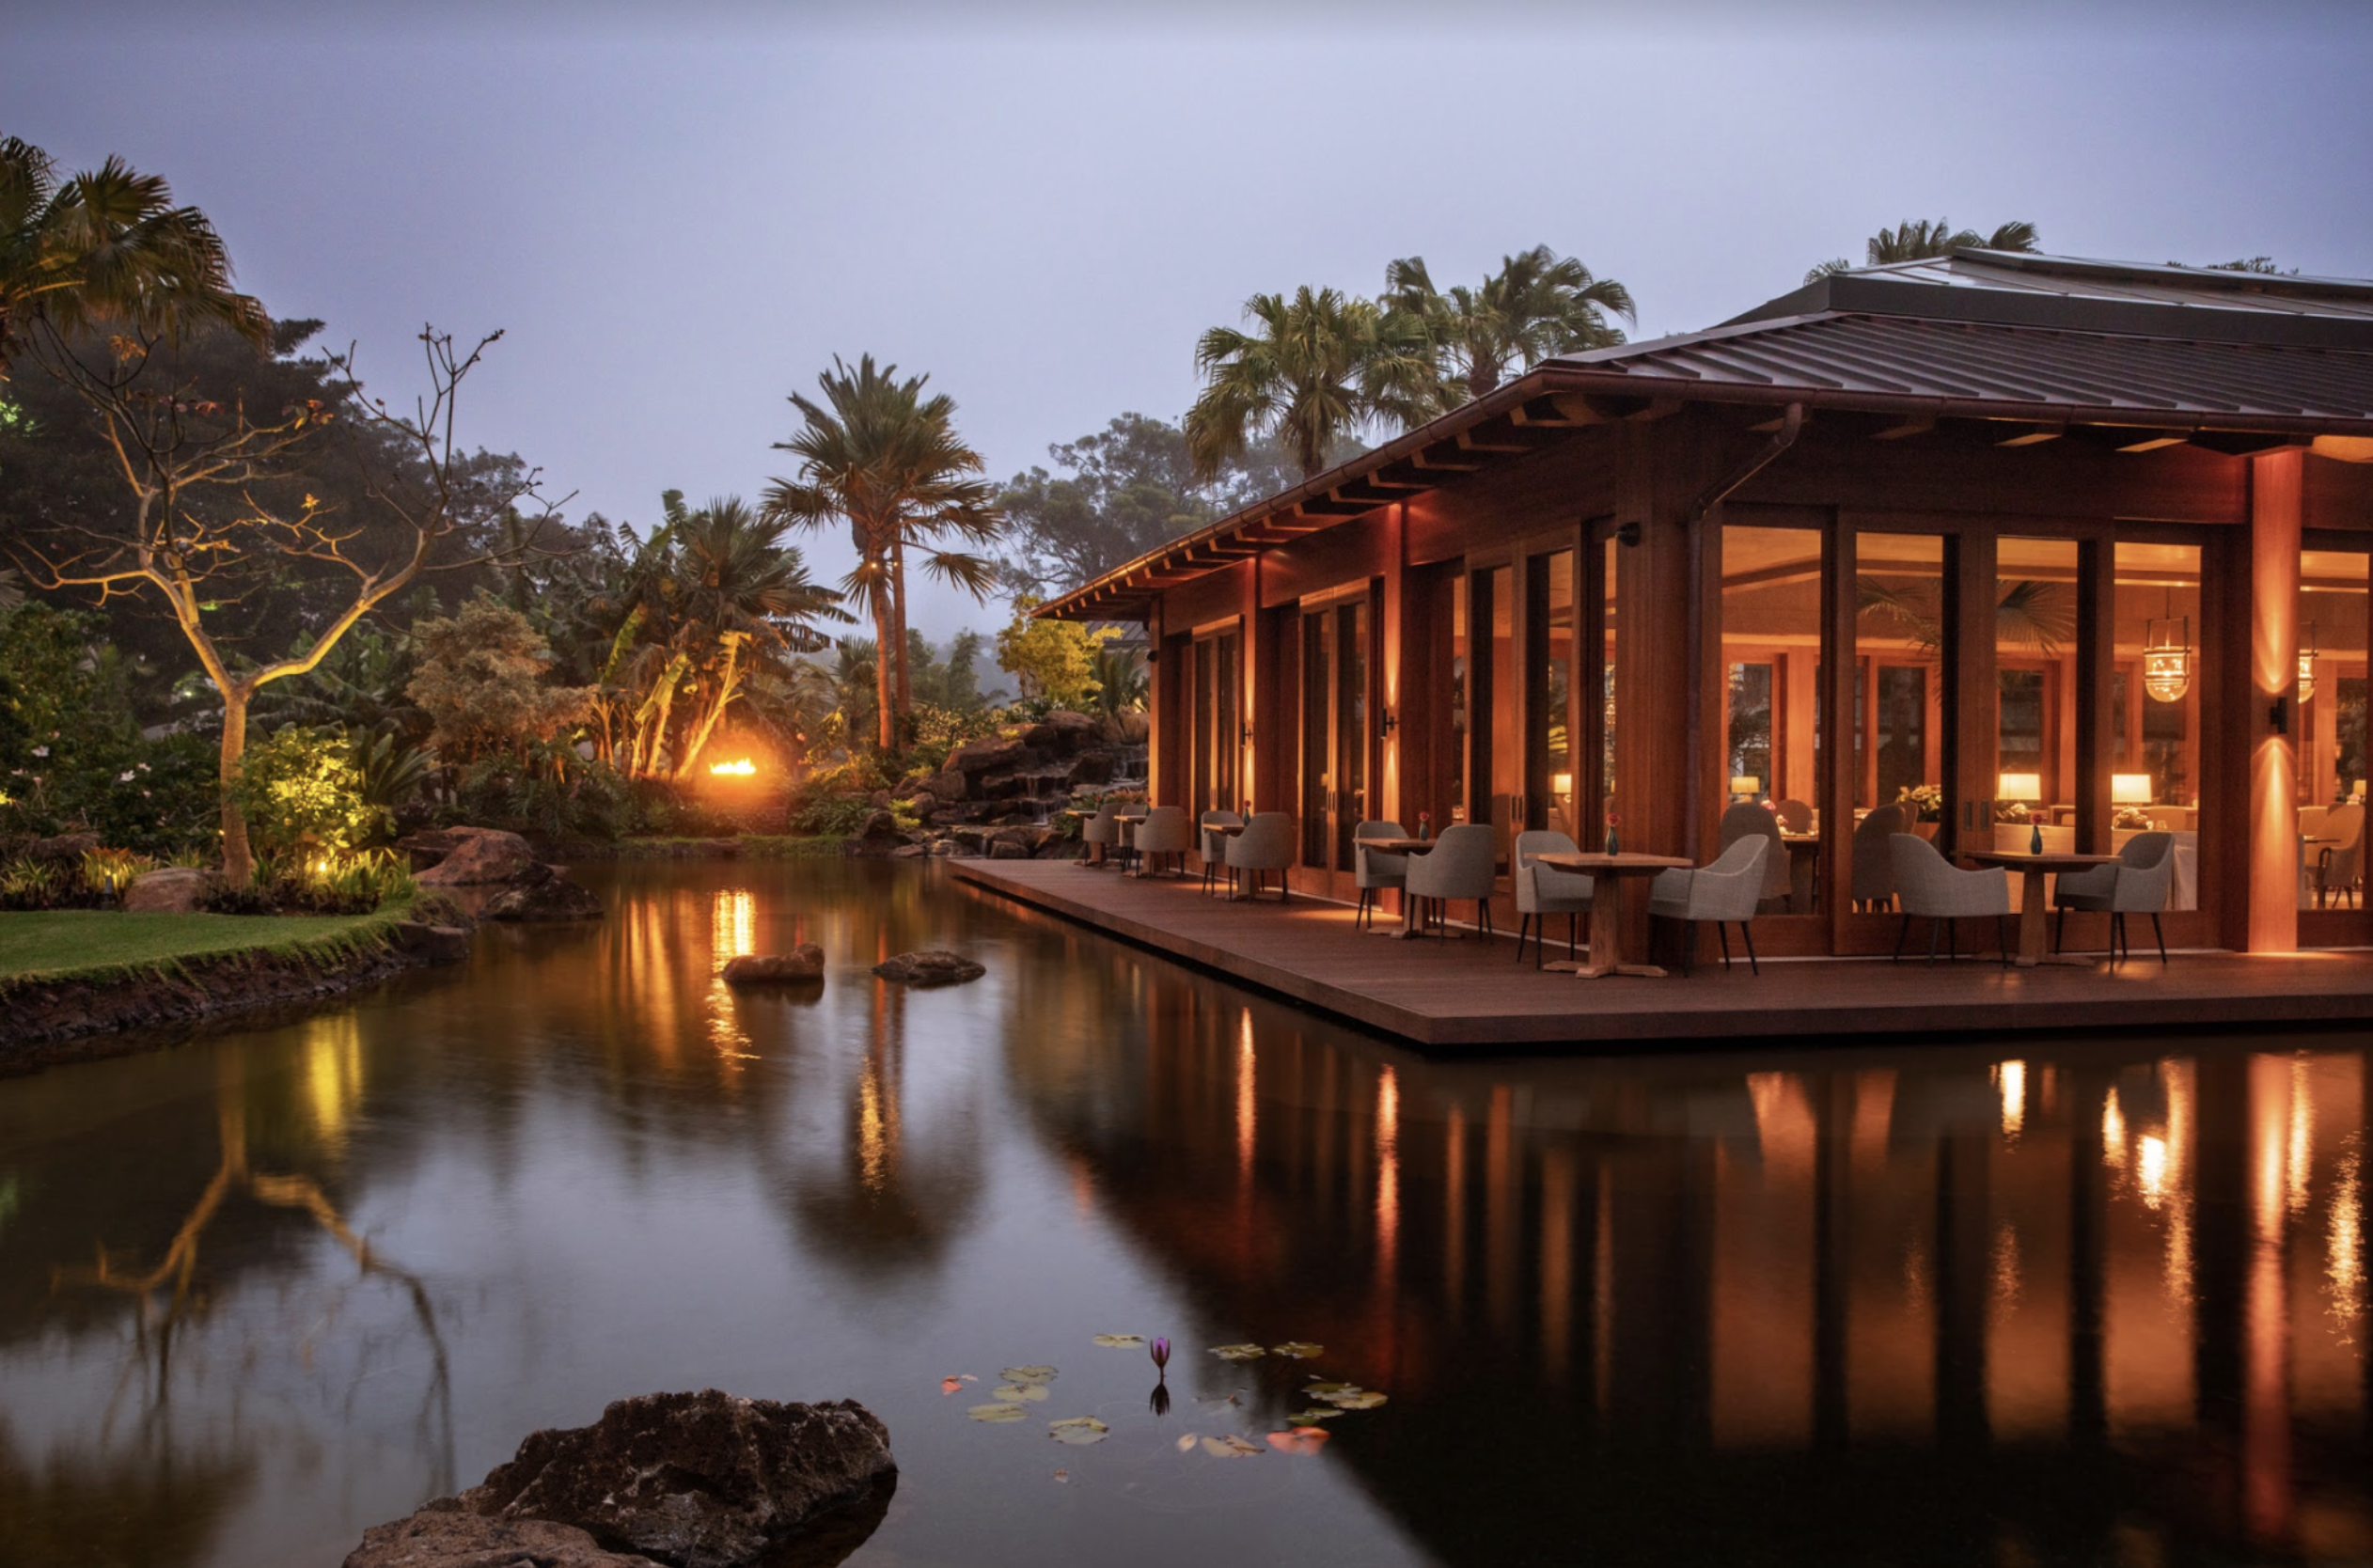 Sensei Lāna'i, A Four Seasons Resort  Reopens With COVID-19 Testing Program